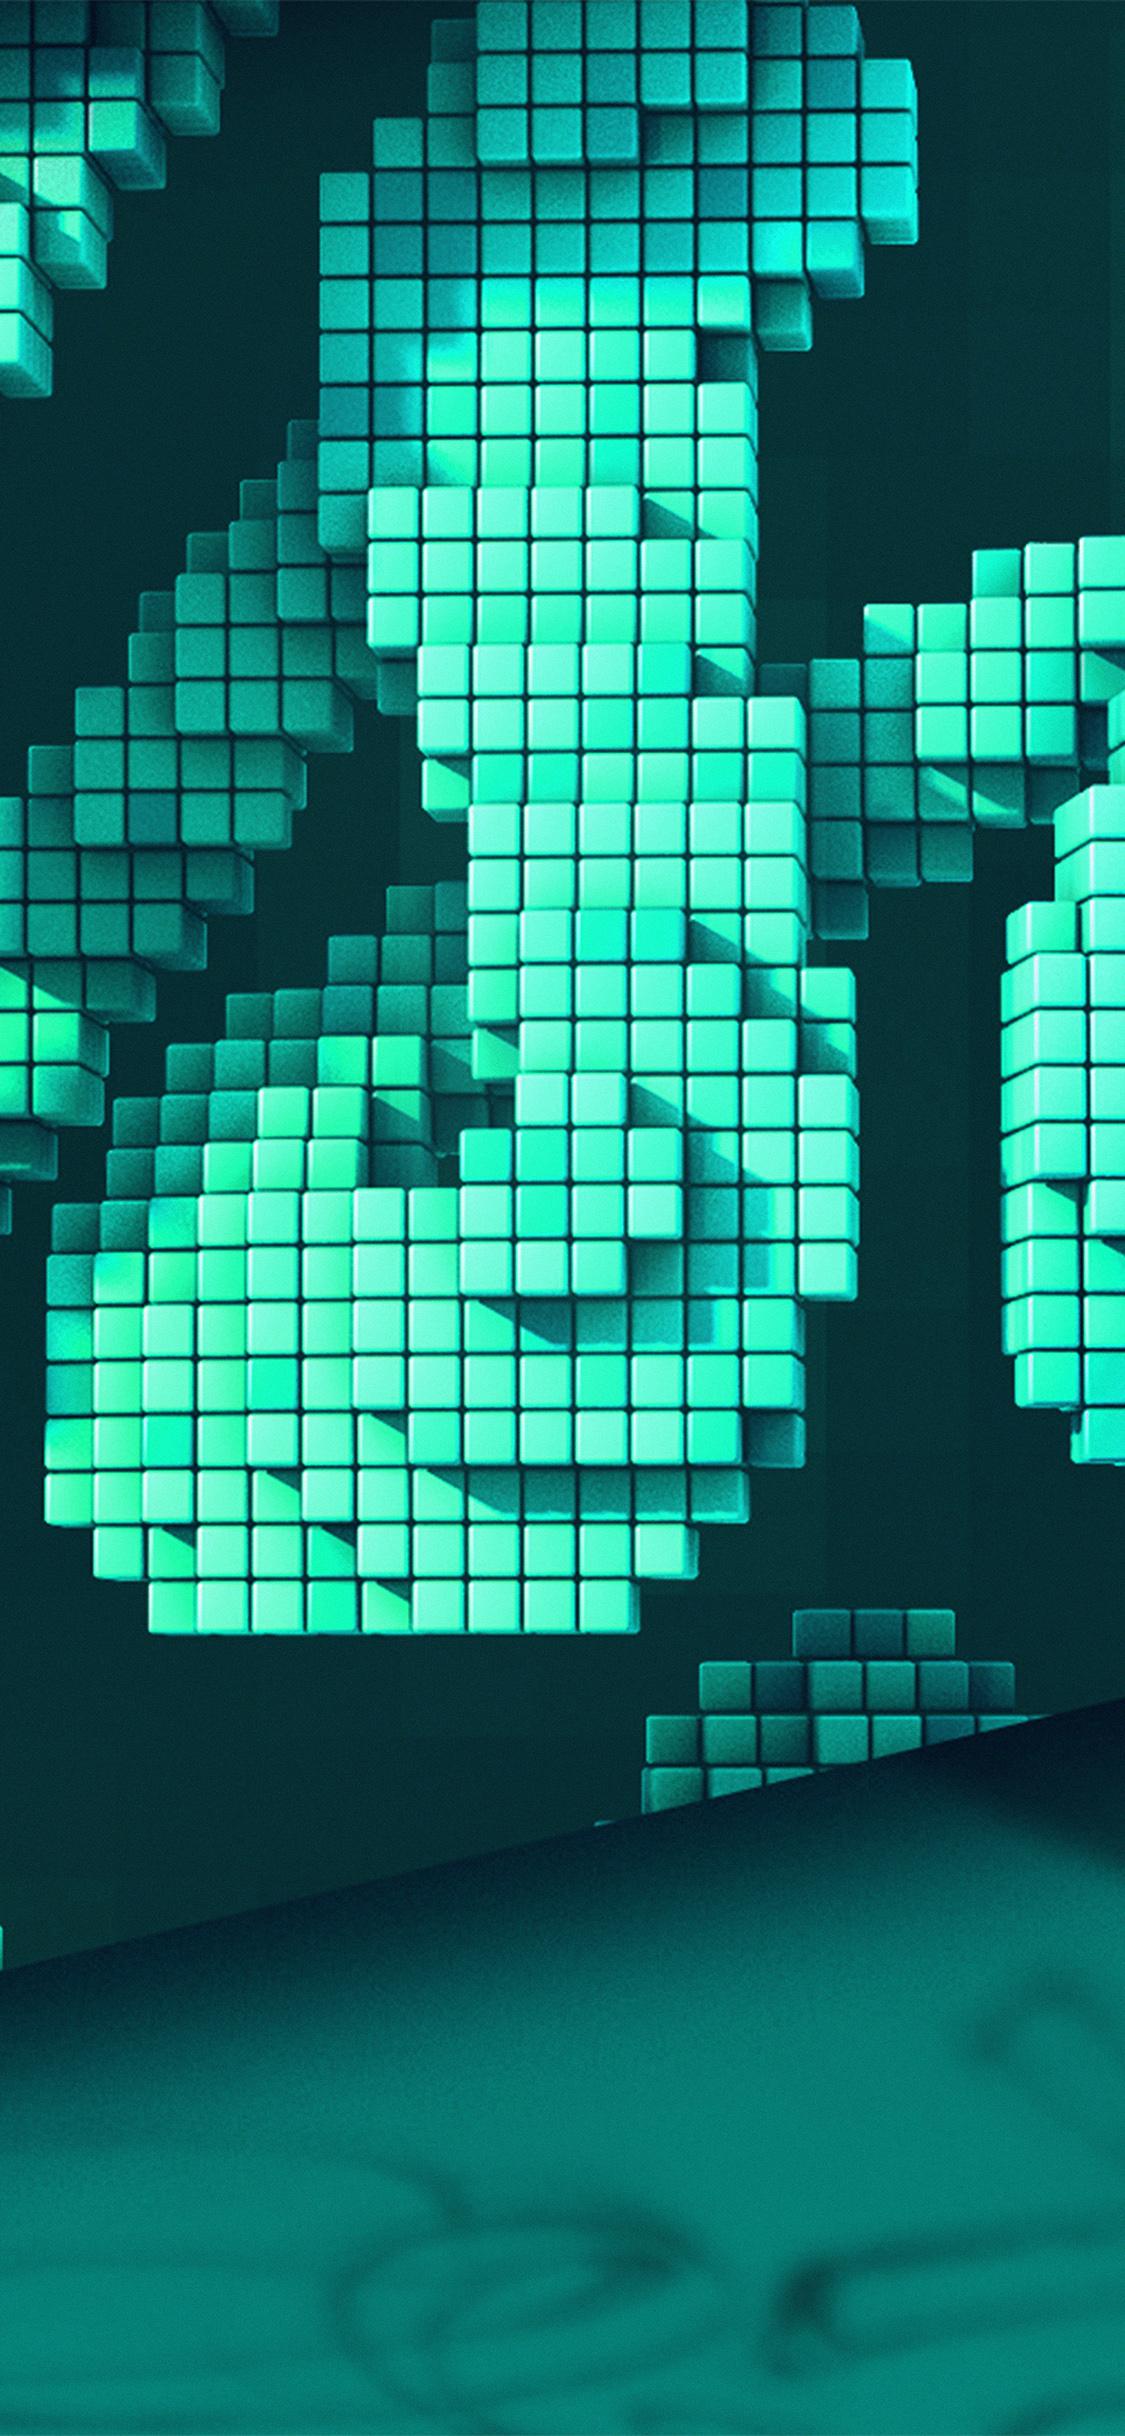 Iphonexpapers Com Iphone X Wallpaper Vw90 Digital Pixel Art Green Pattern Background